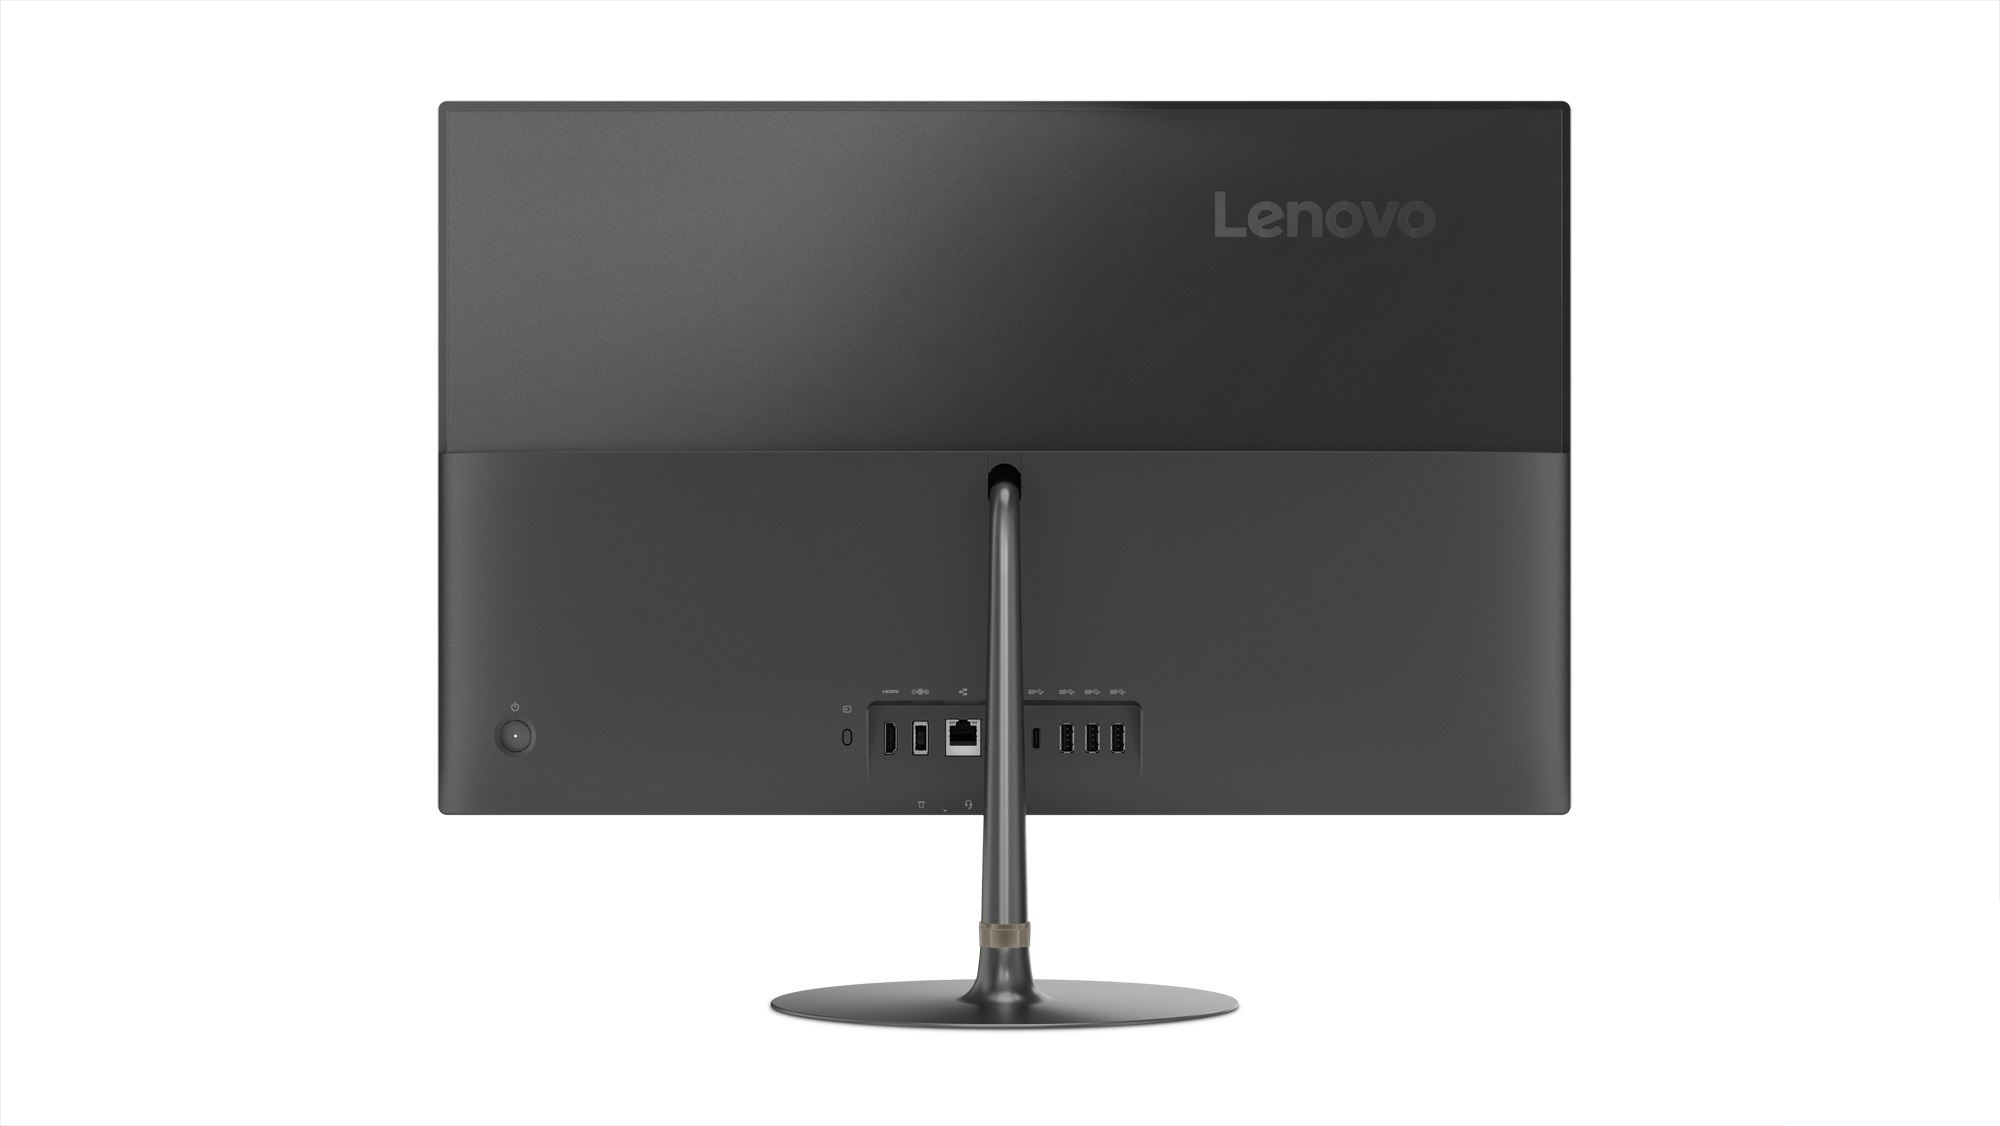 Фото  Моноблок Lenovo ideacentre 730s-24IKB (F0DX001LUA) Iron Gray